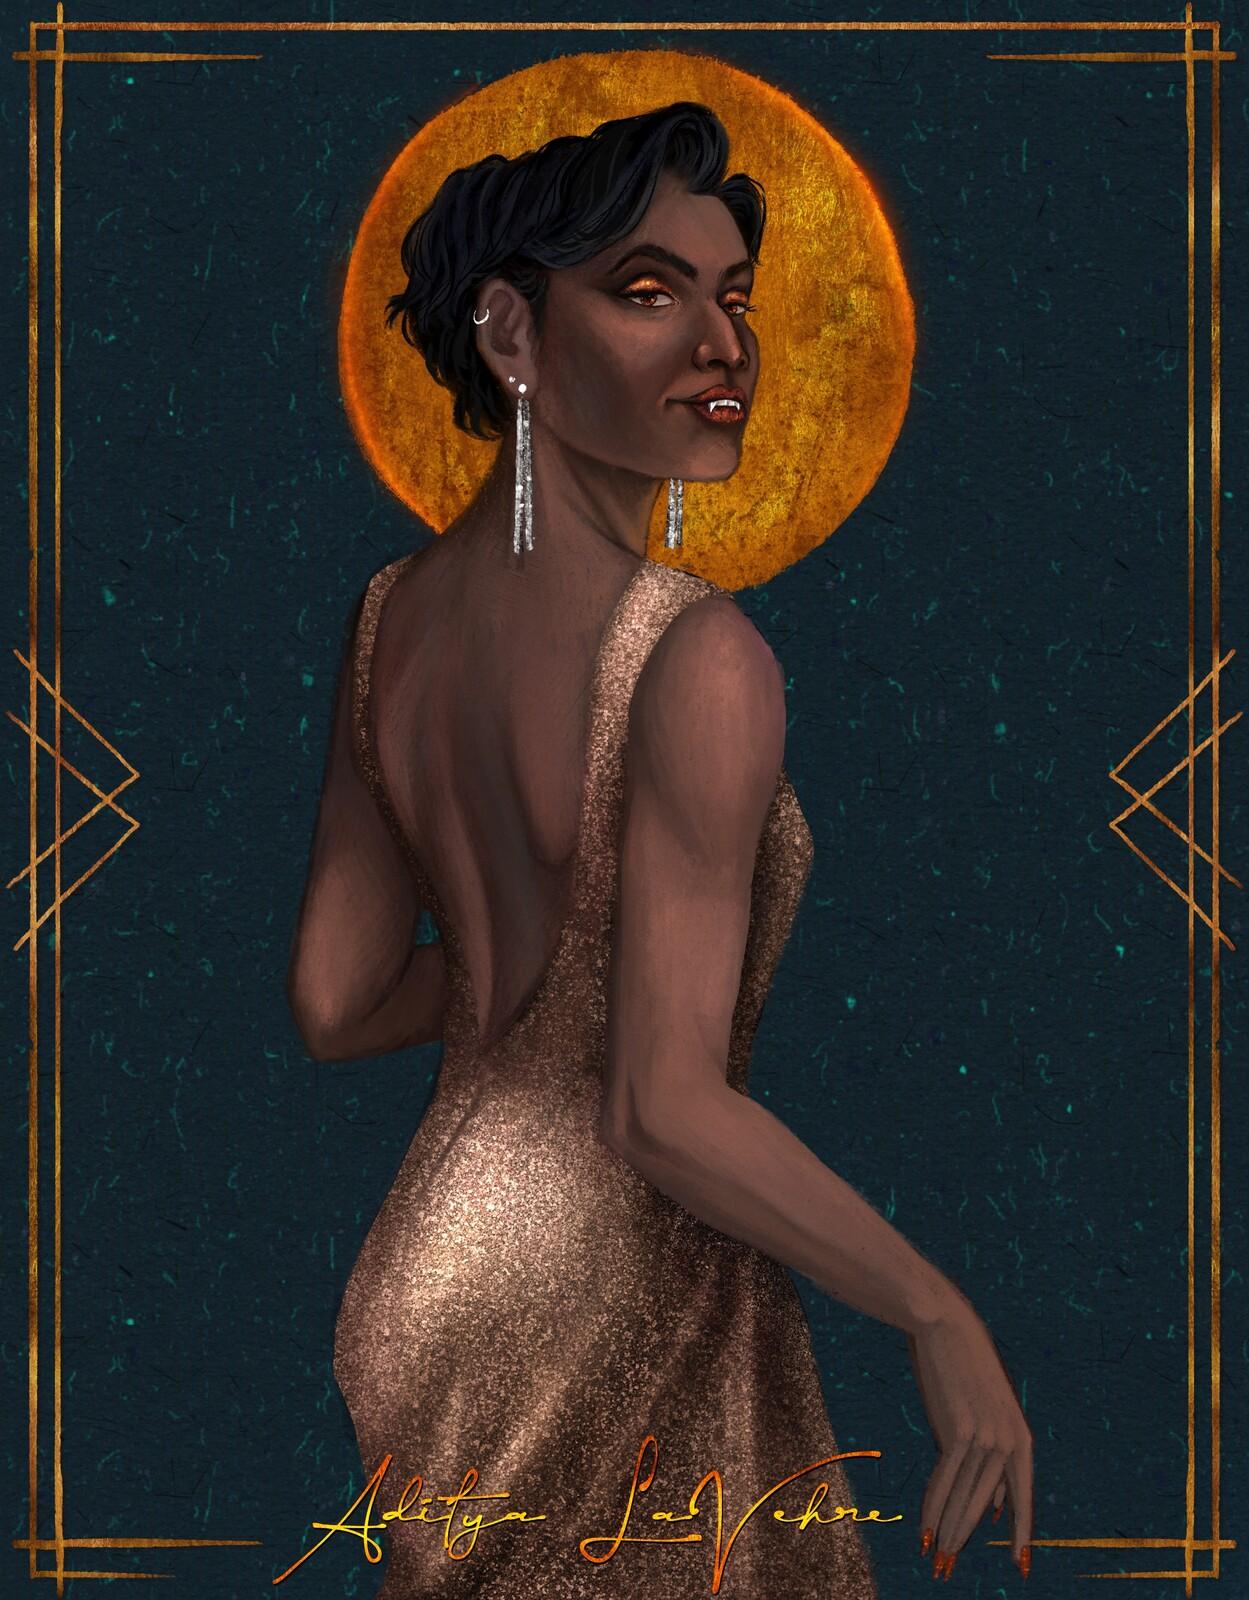 Character Illustration - Aditya LaVehre